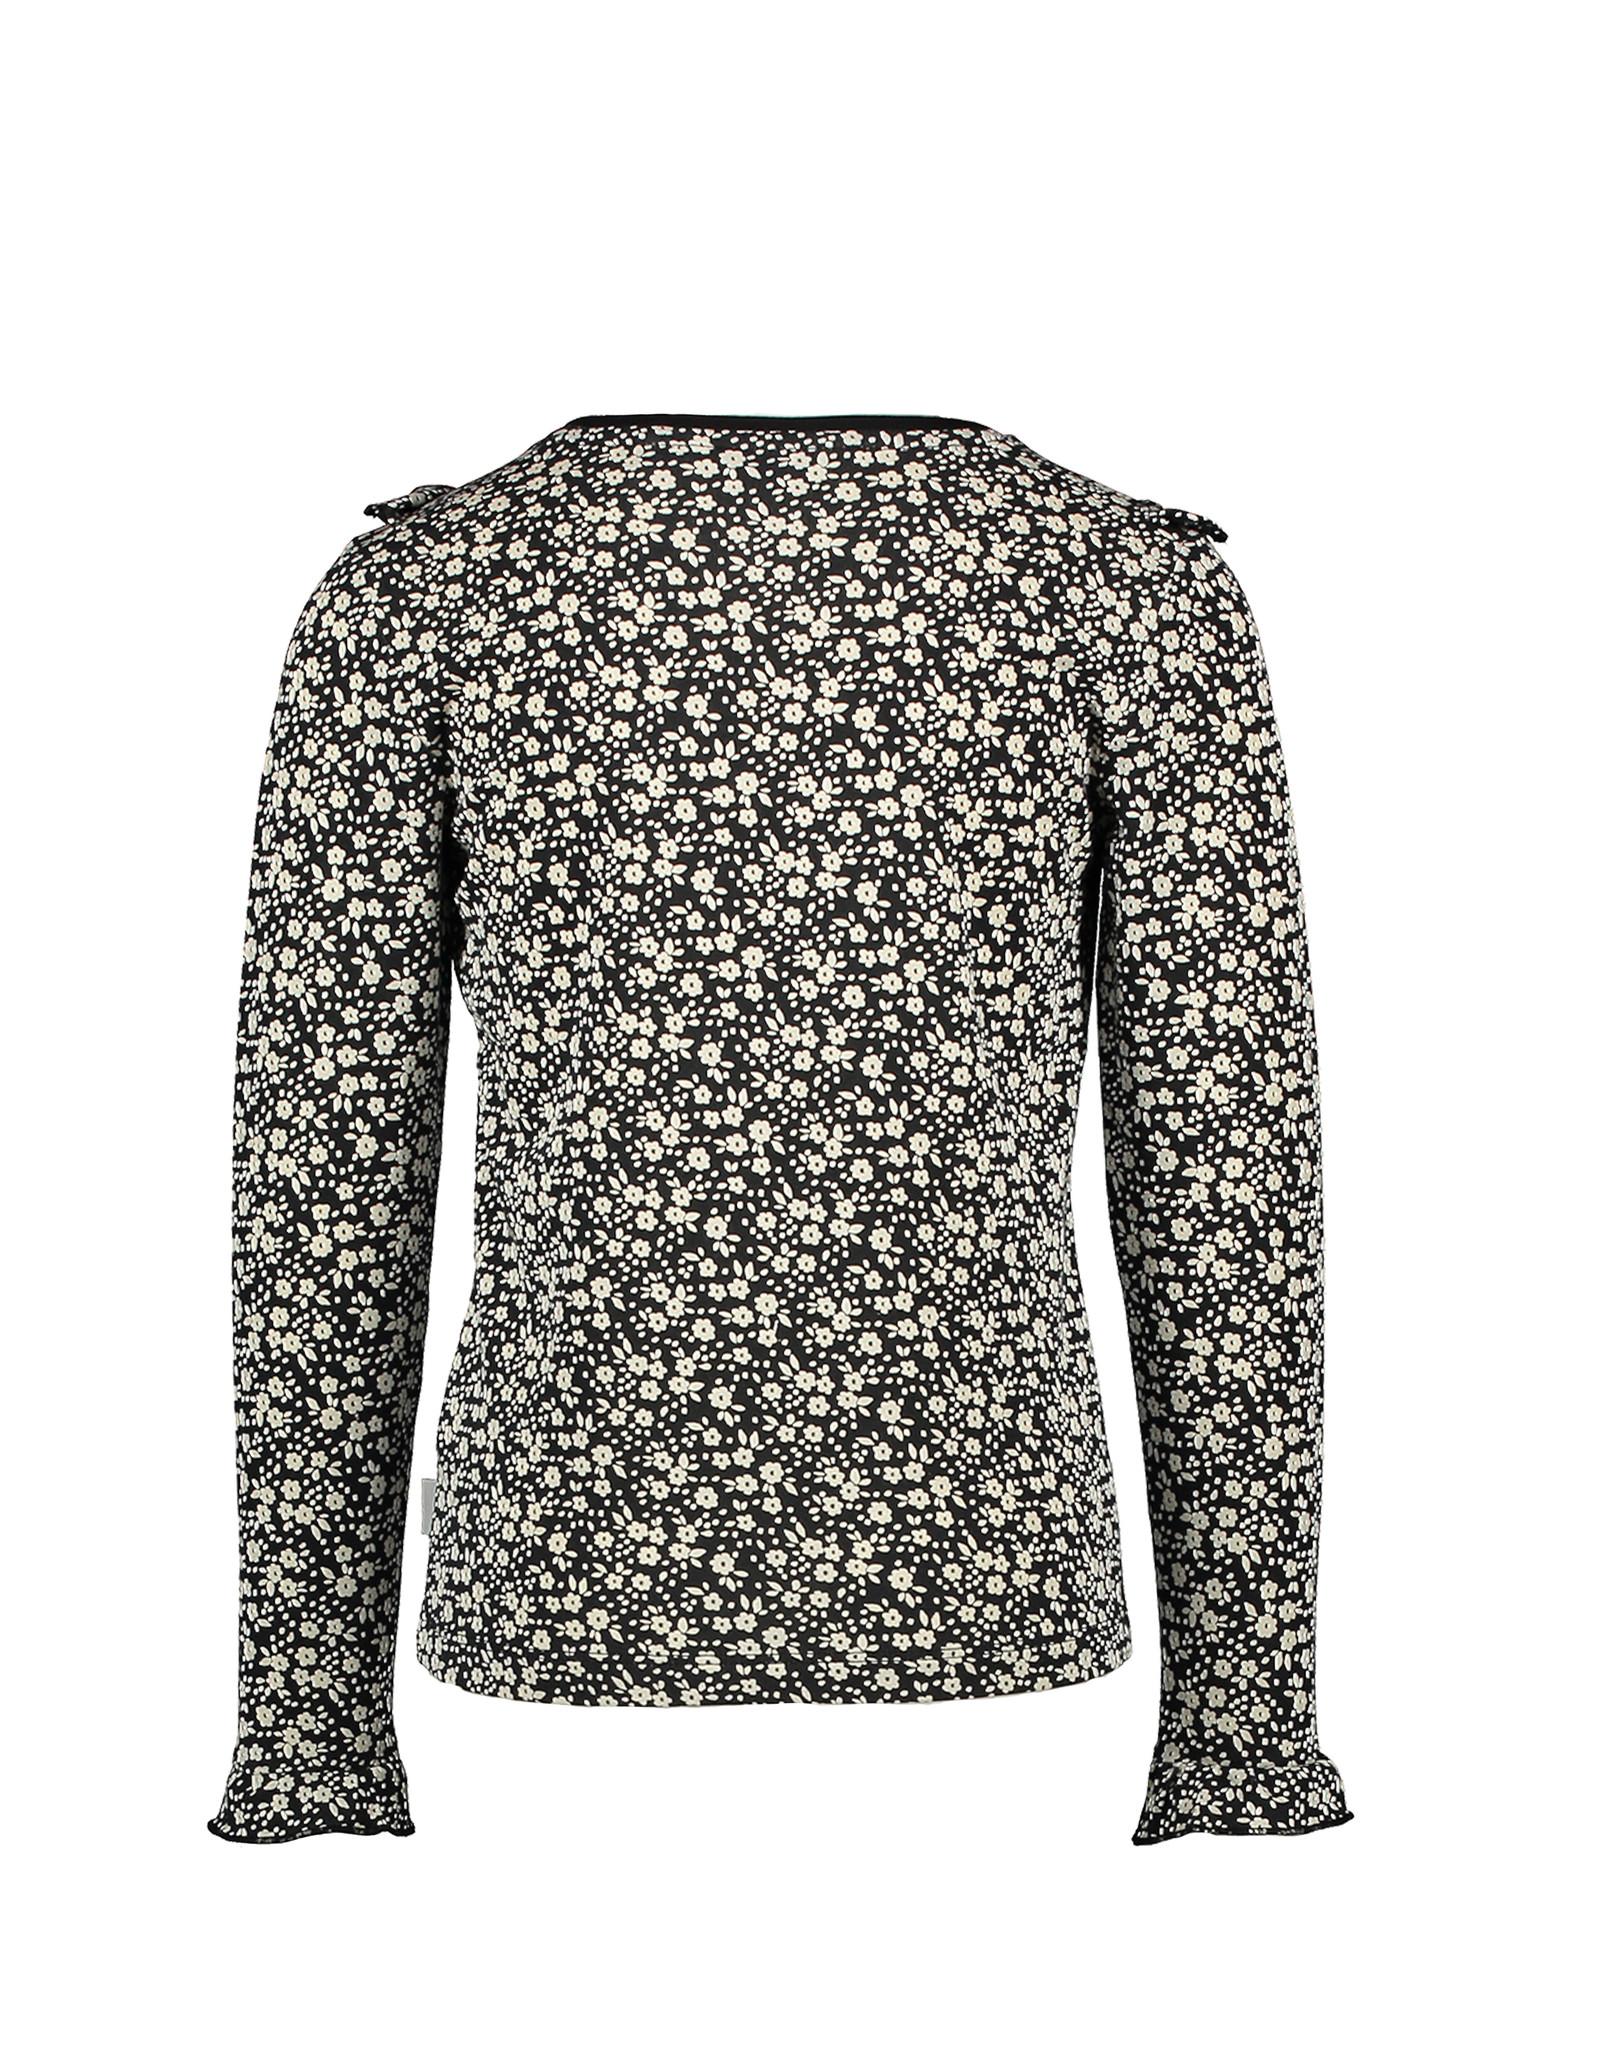 Moodstreet Moodstreet shirt 5404 black